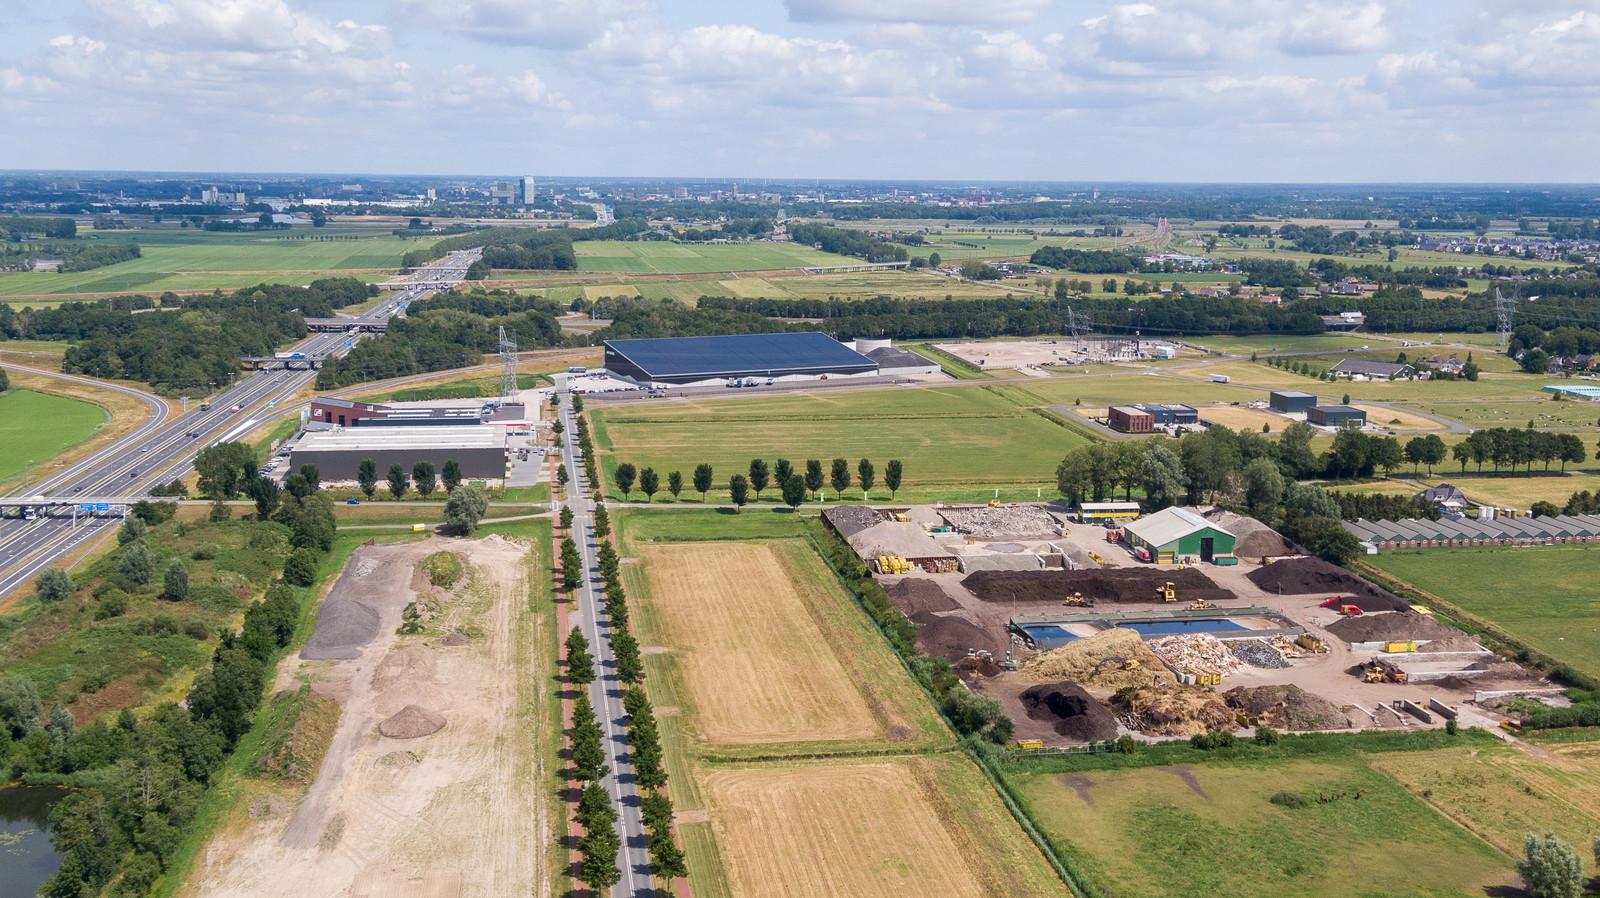 Bedrijventerrein H2O in 2019. Op de achtergrond Zwolle.